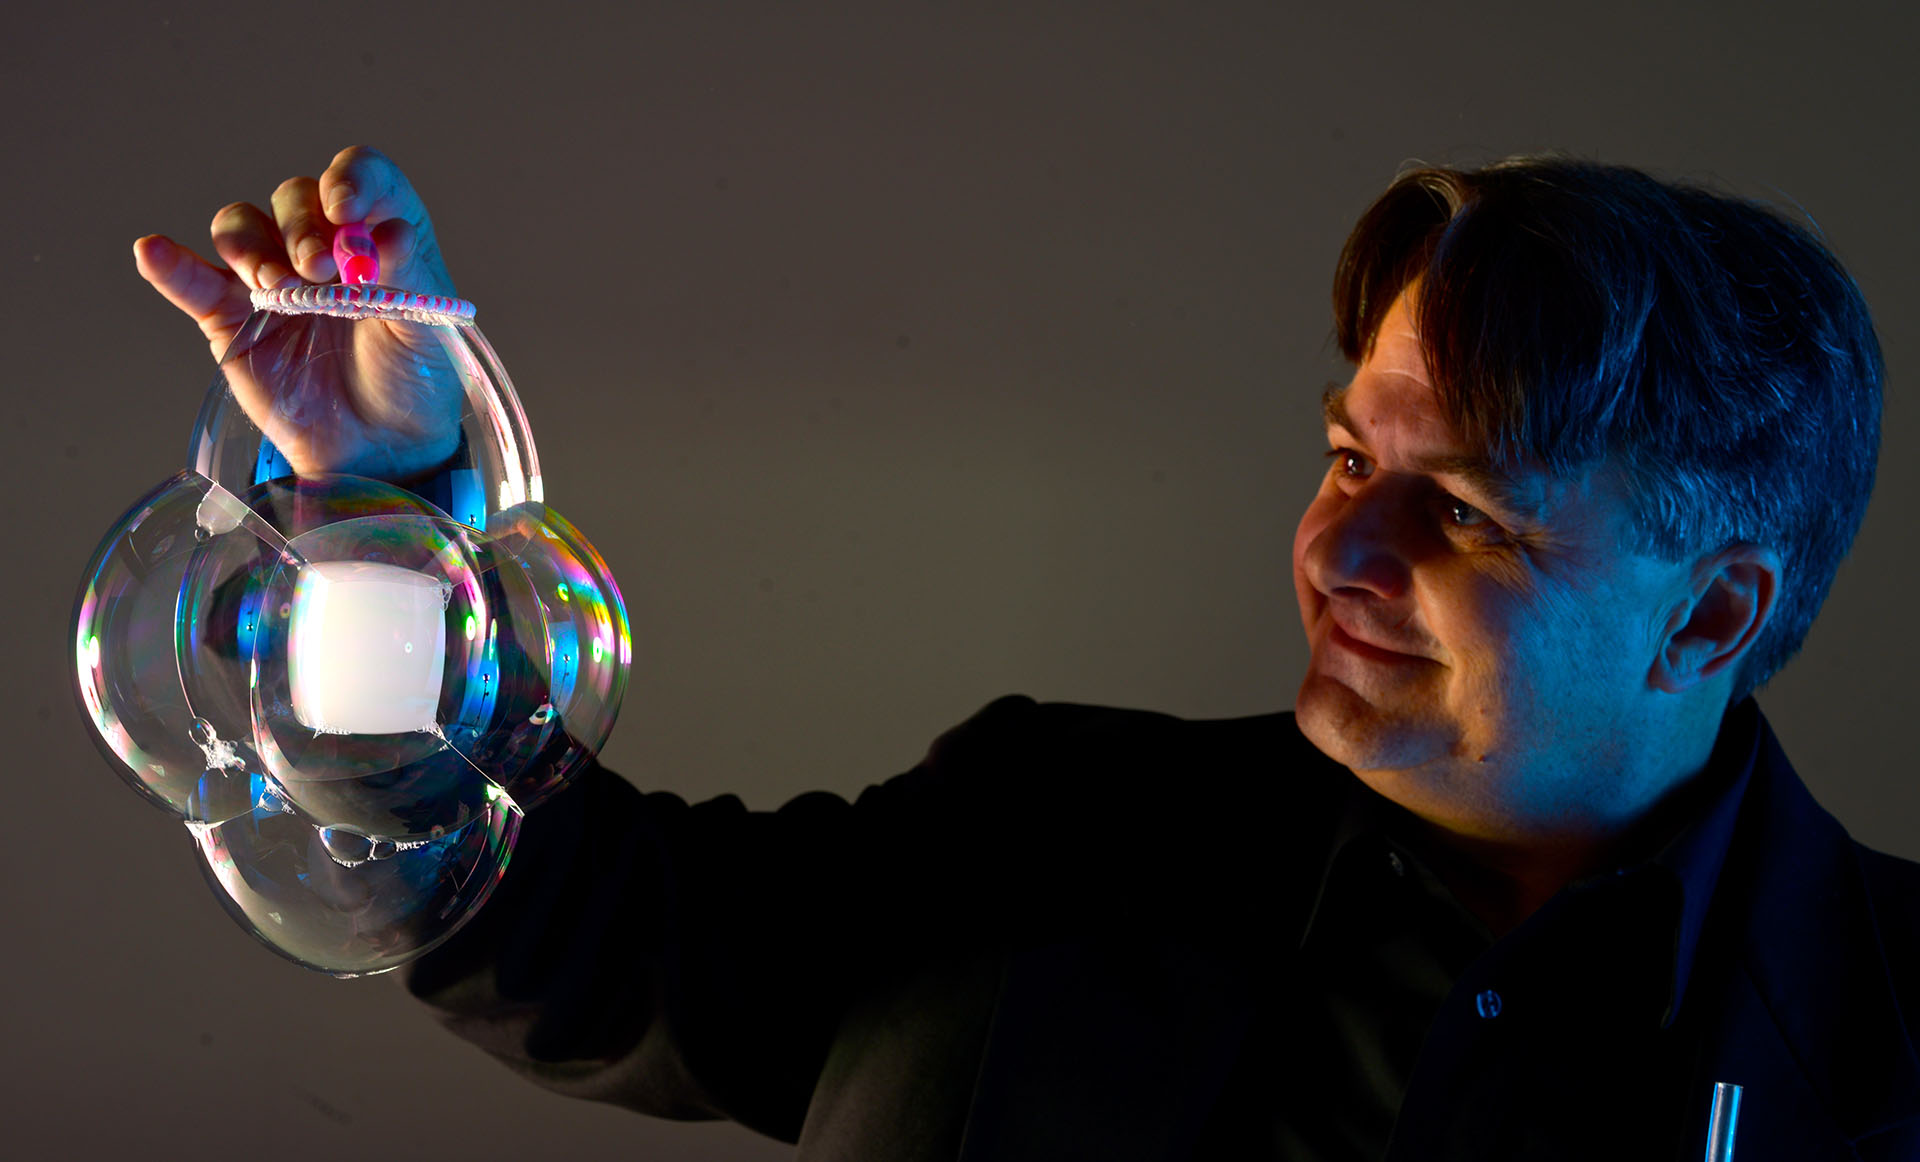 Steve Langley - Bubbleologist